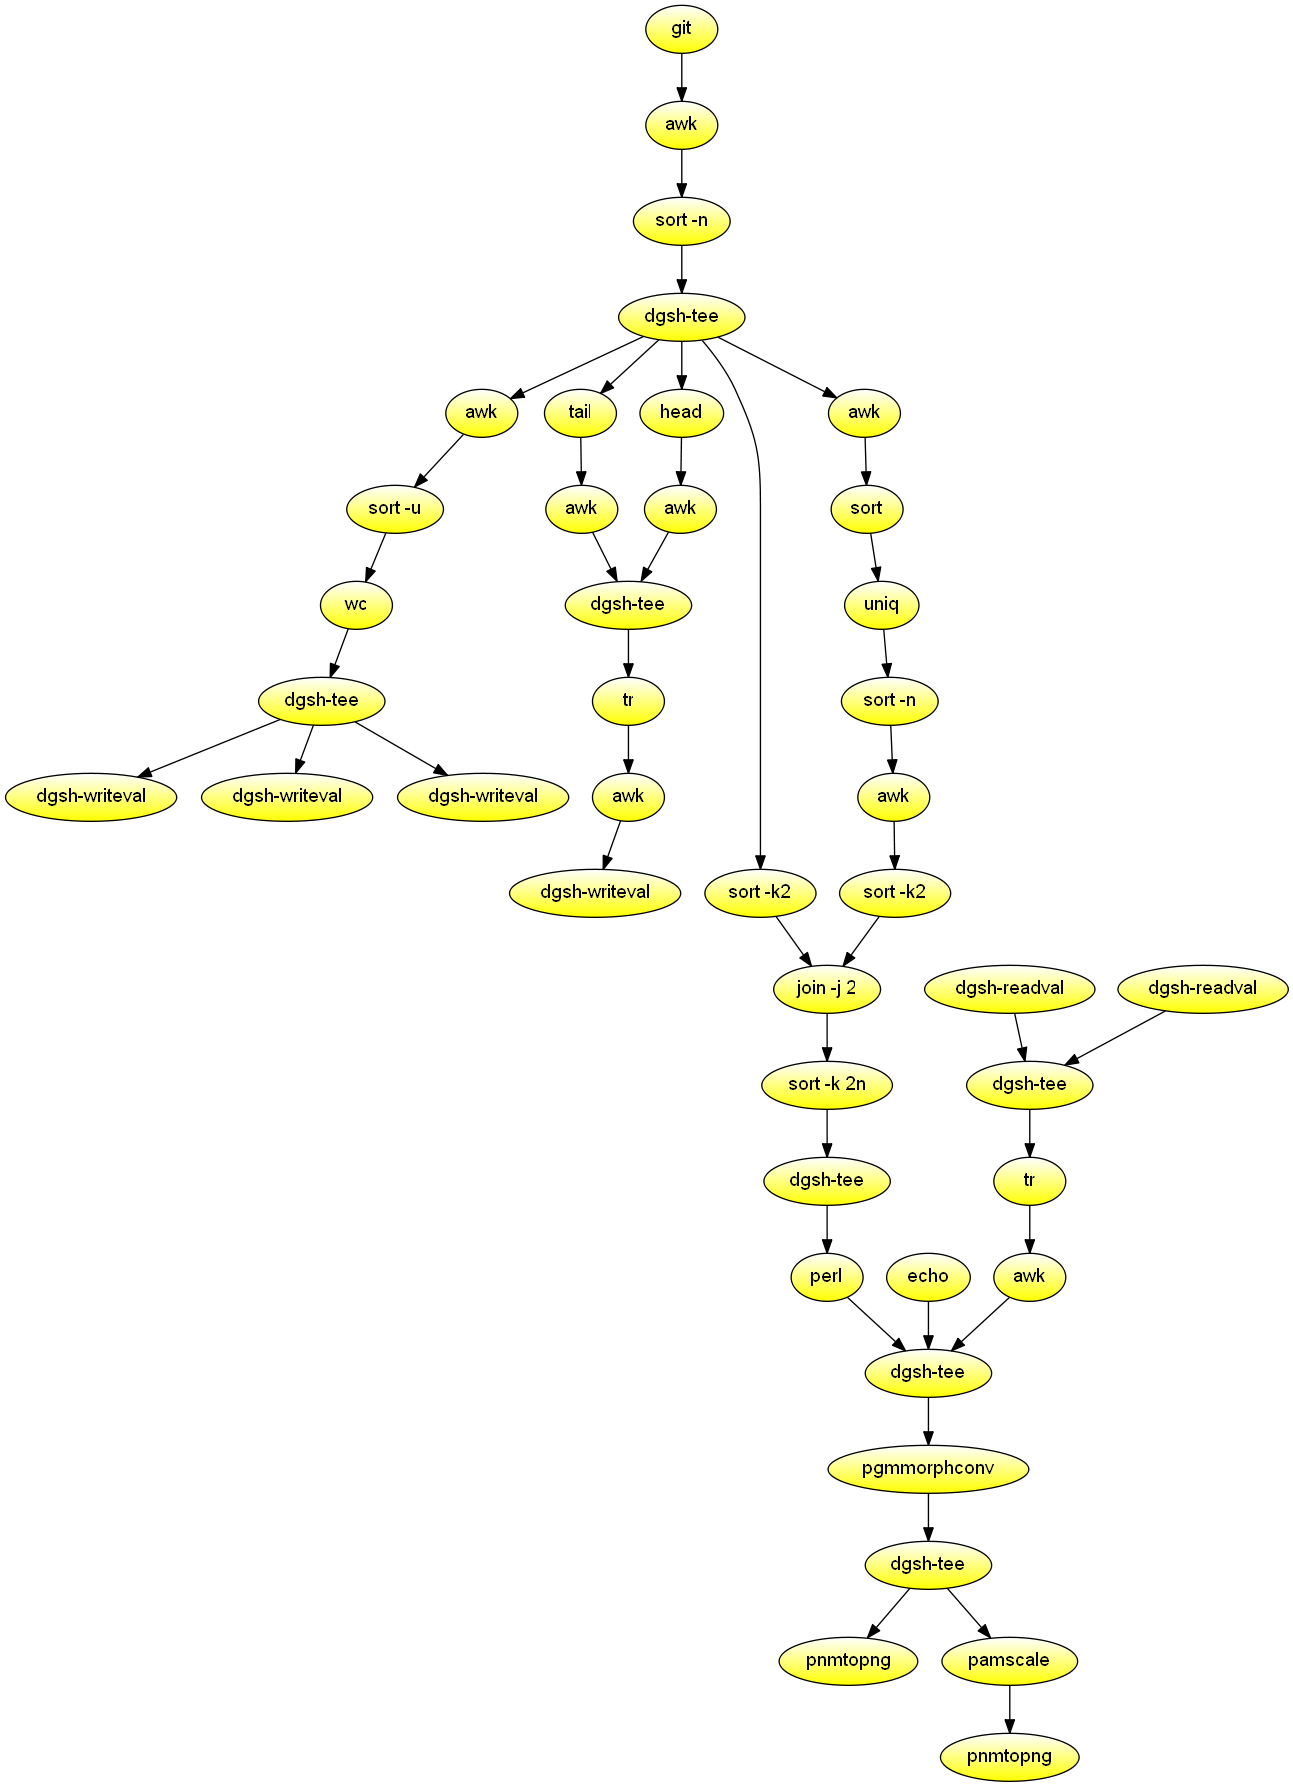 dgsh — directed graph shell